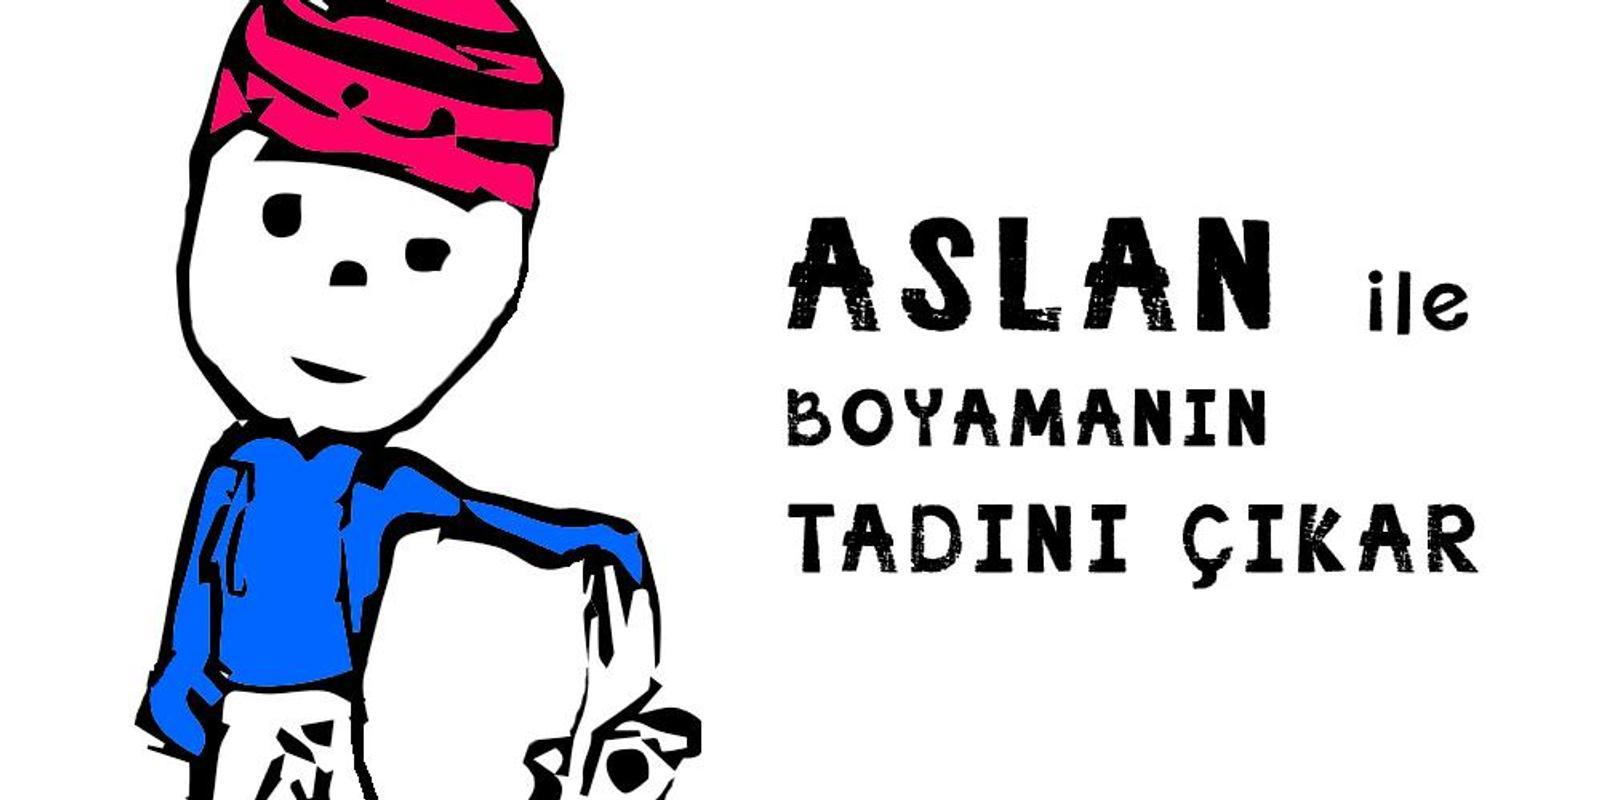 Aslan çizgi Filmi Boyama Oyunu For Android Apk Download